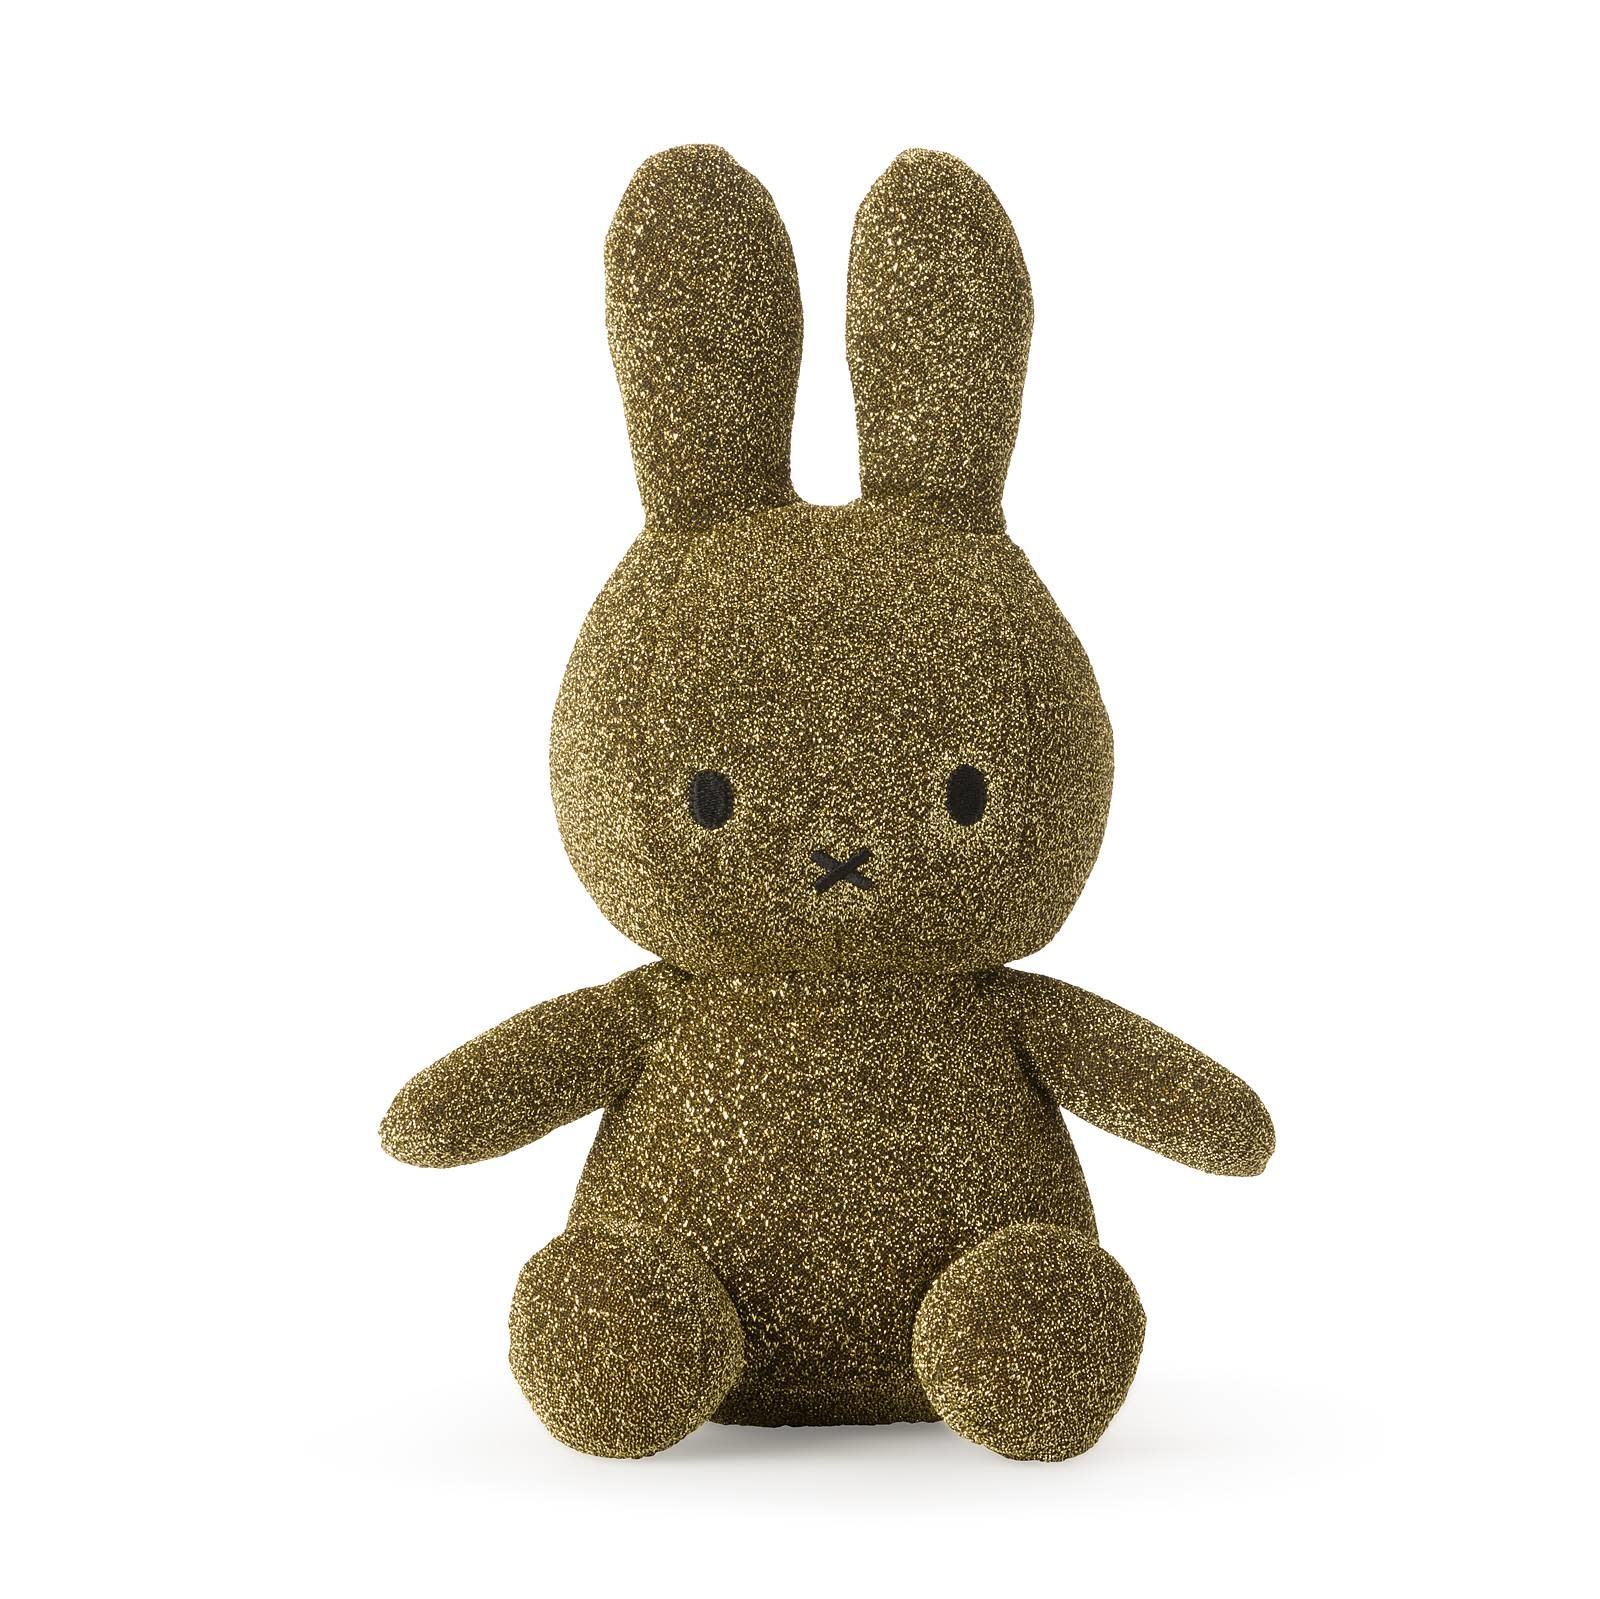 "Nijntje/Miffy/Snuffy Miffy Sitting Sparkle Gold - 23 cm - 9"" Limited Edition"